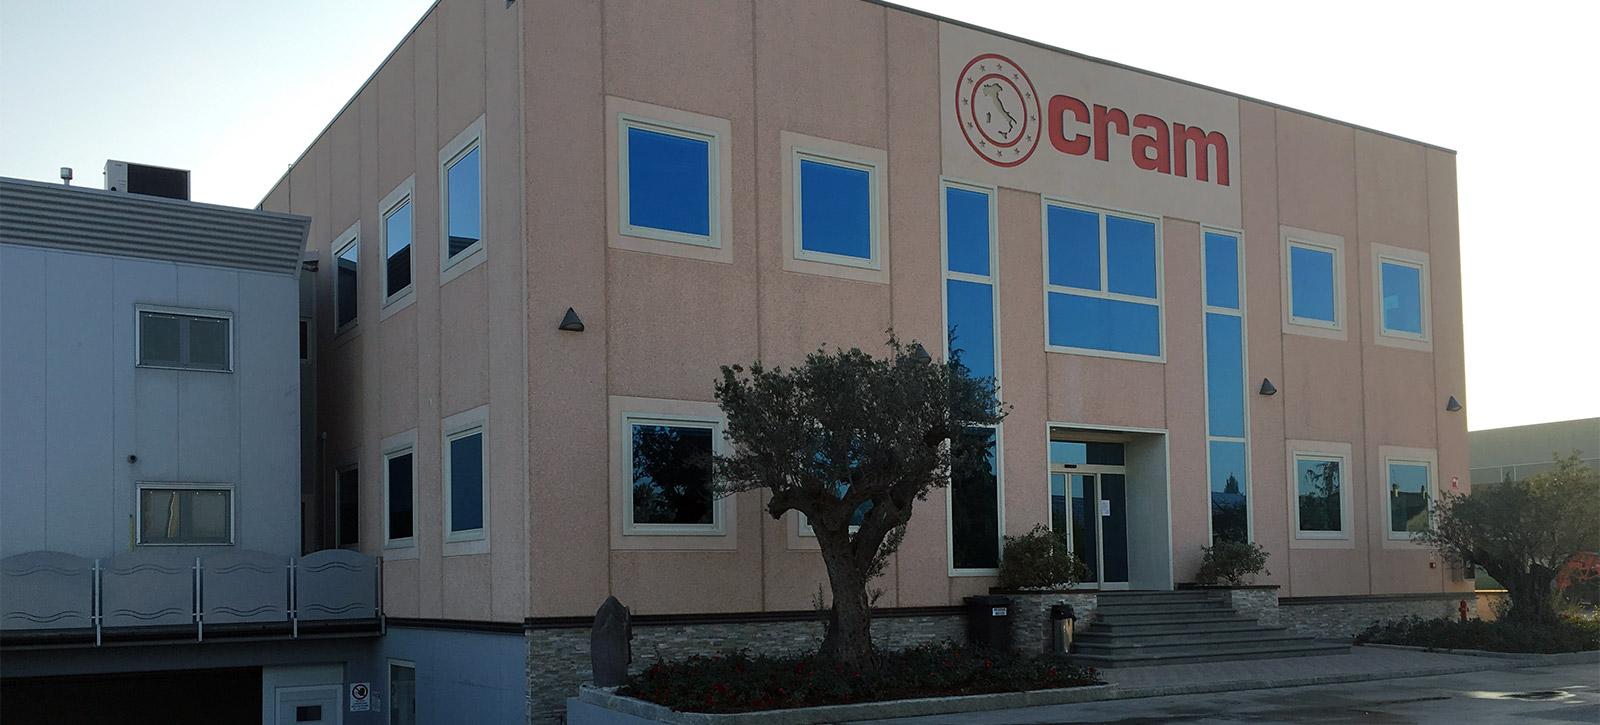 cram-azienda